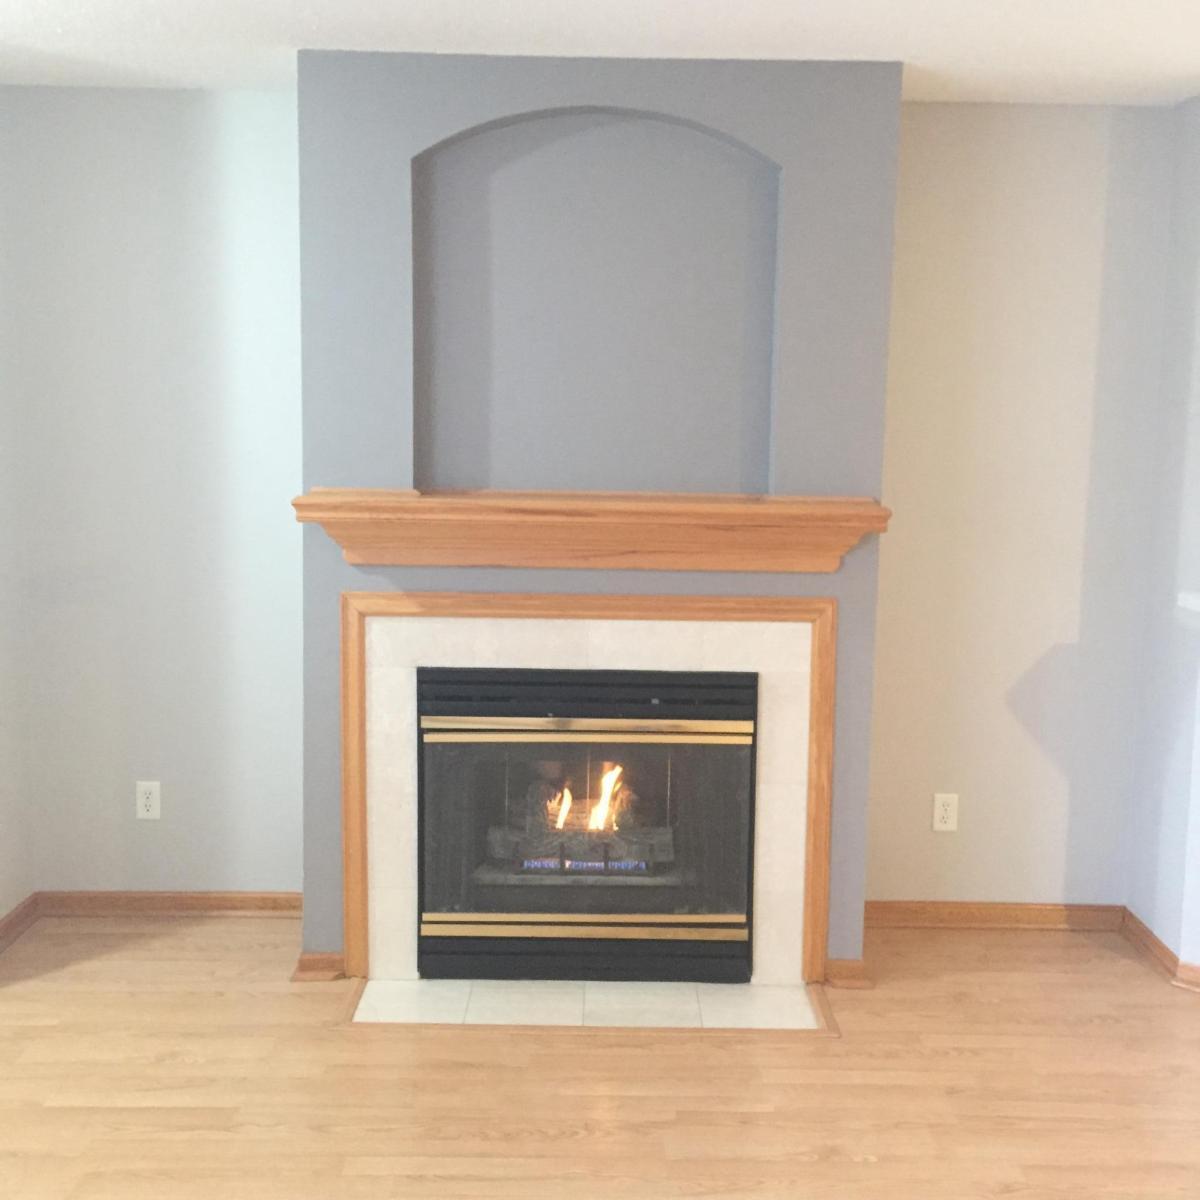 Living Room Fireplace 7425 Wistful Vista Drive 1007